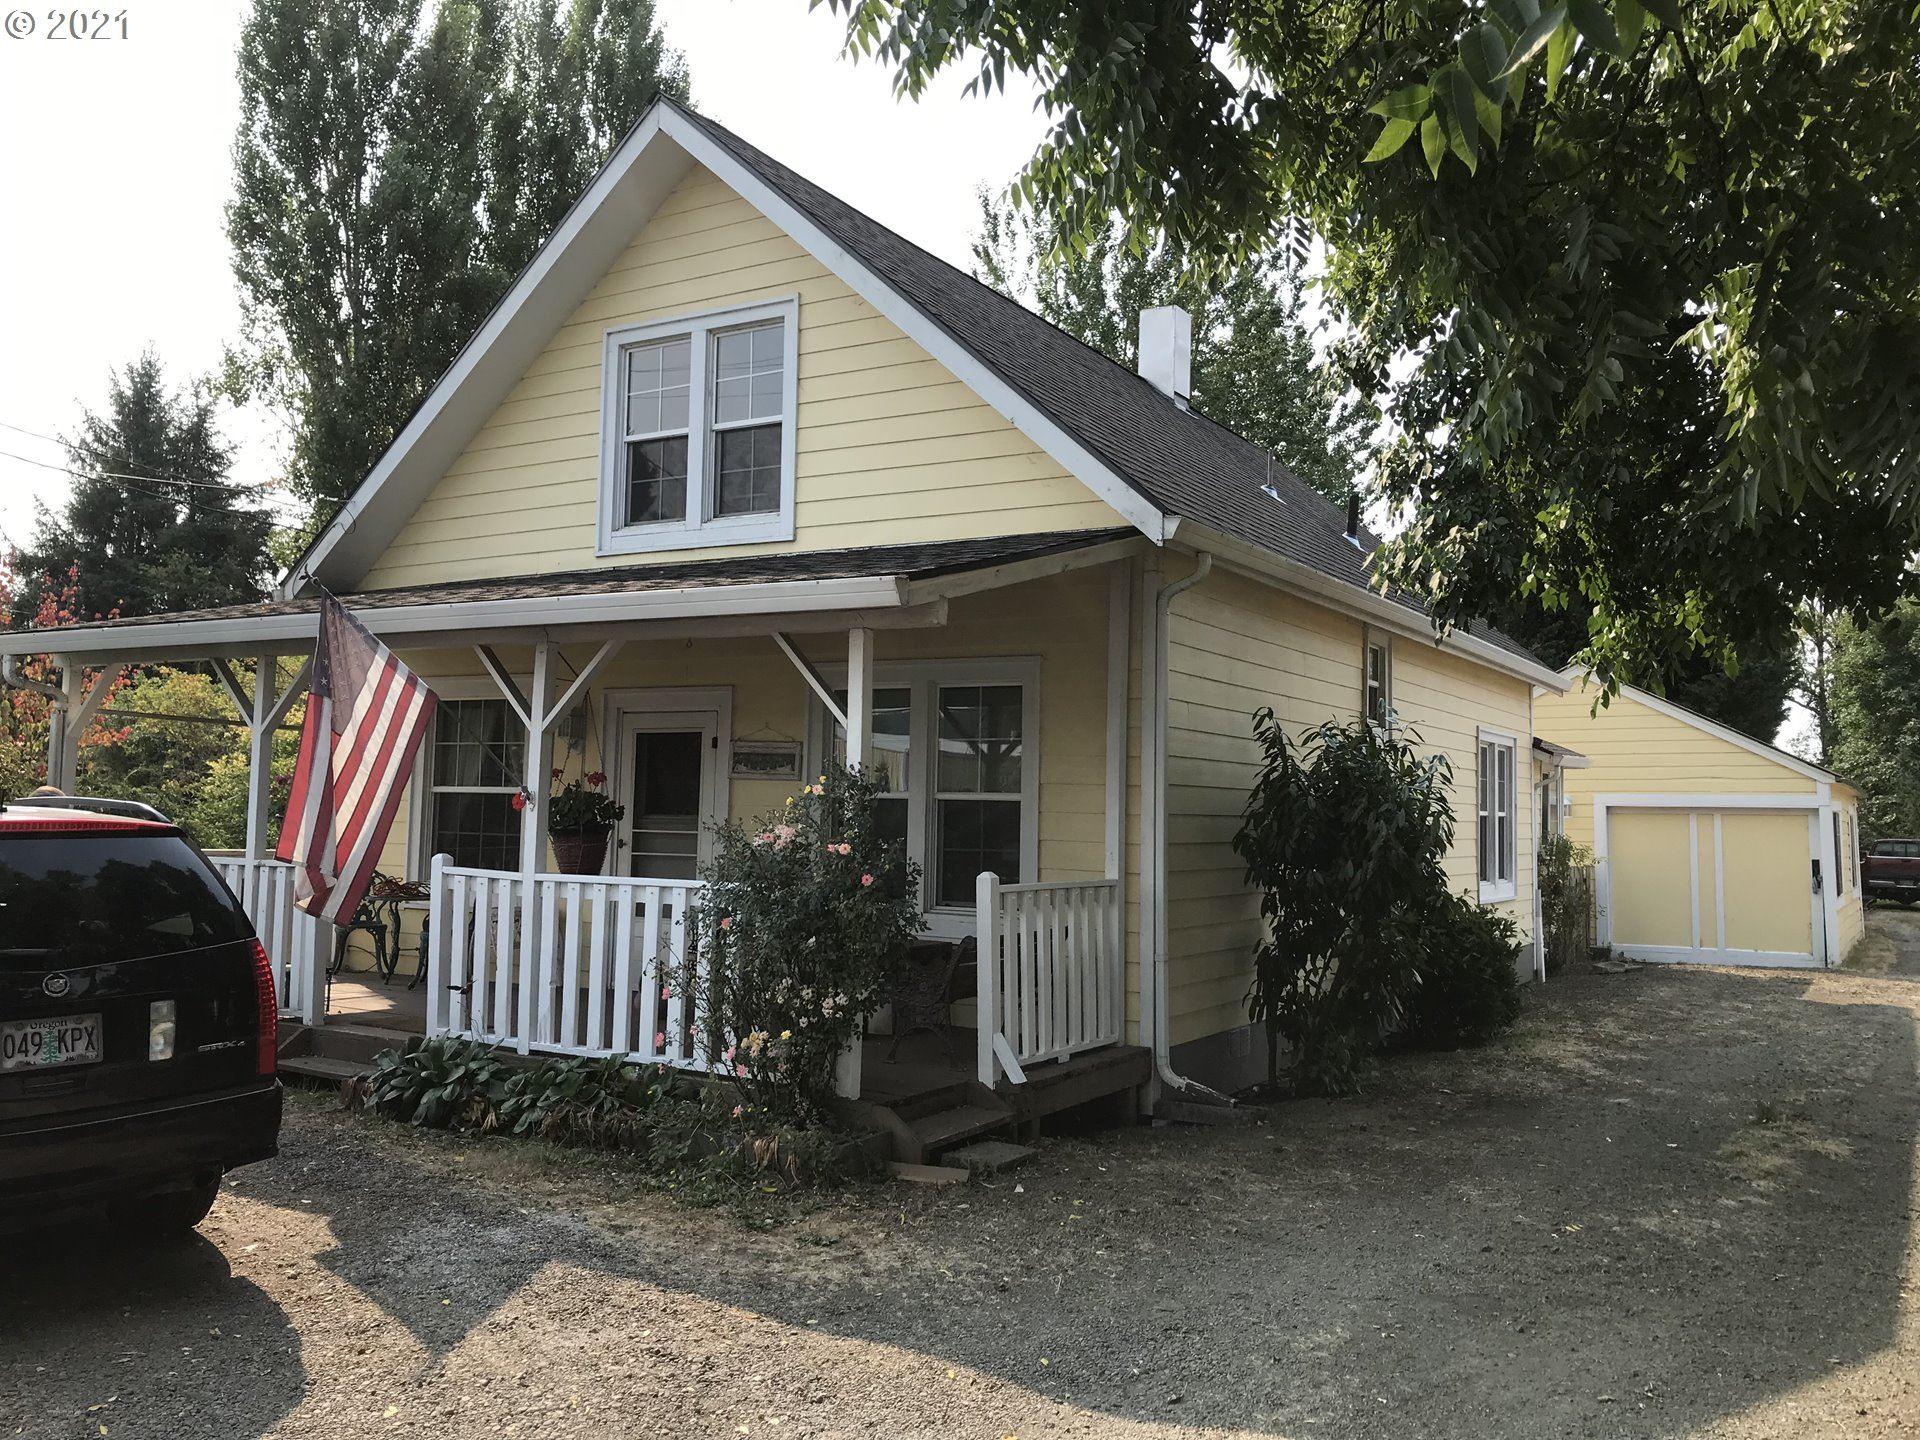 Photo of 1024 W MAIN ST, Sheridan, OR 97378 (MLS # 21376117)